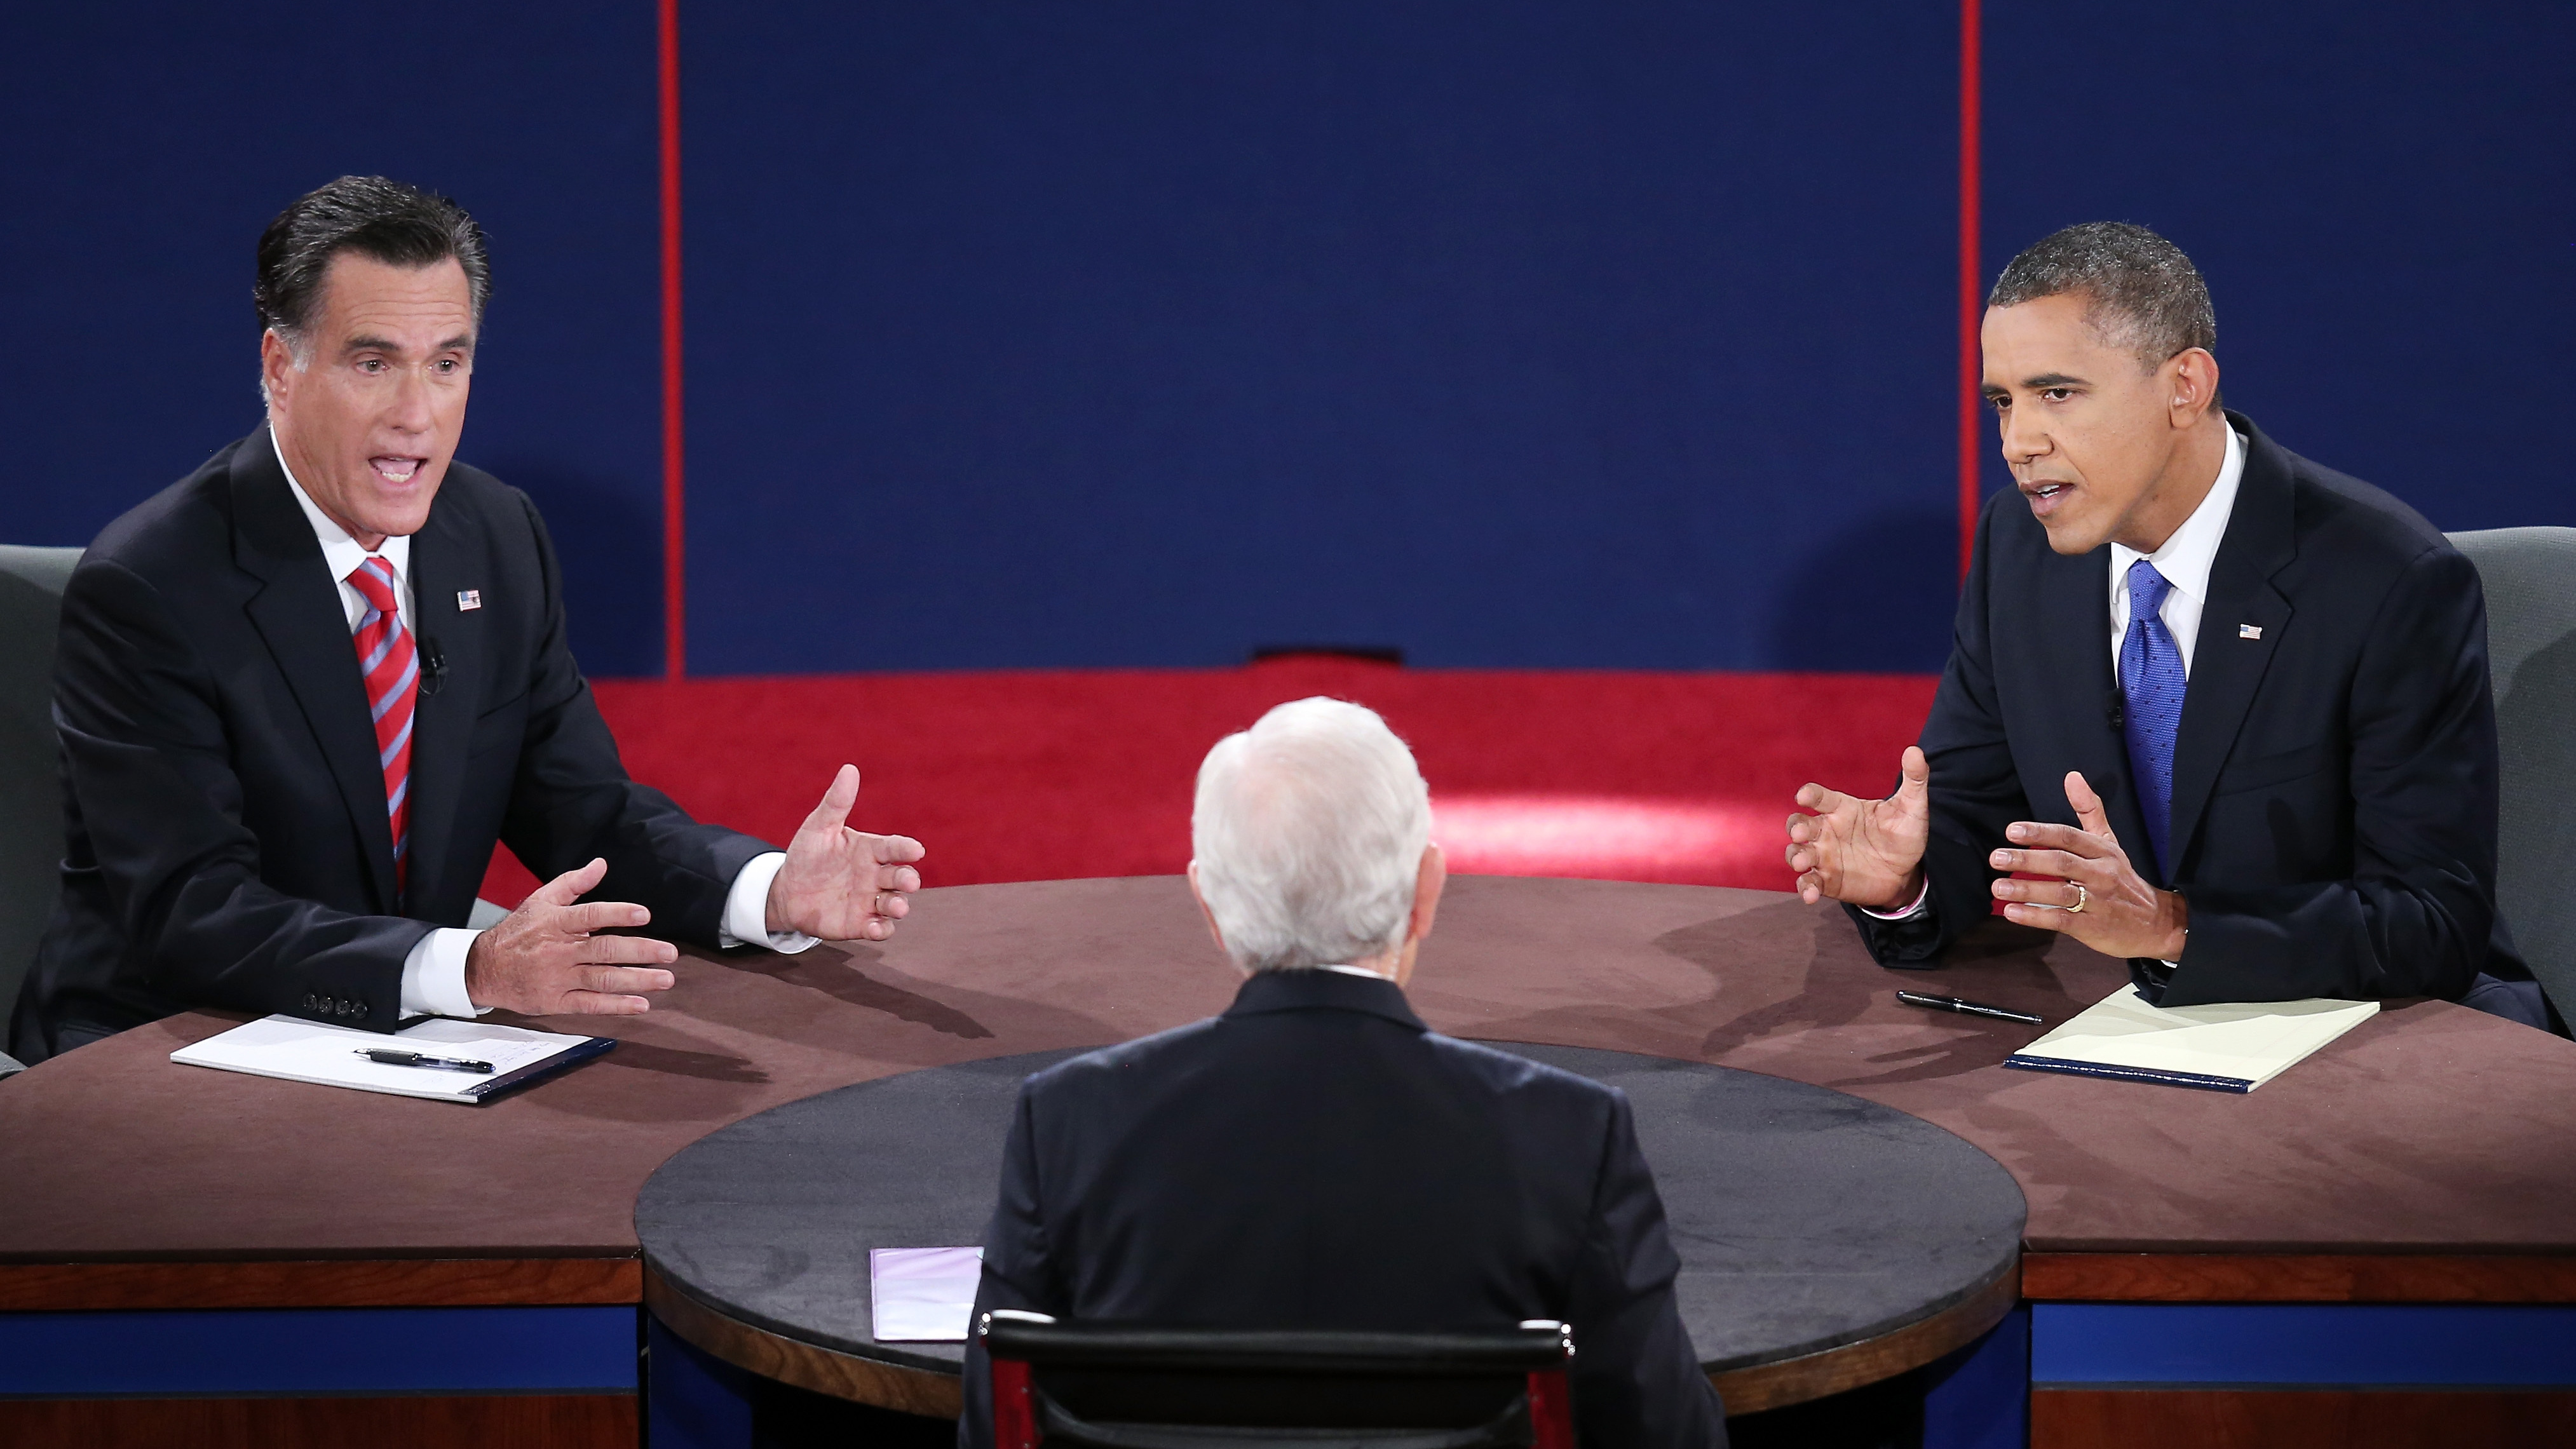 Debate #3